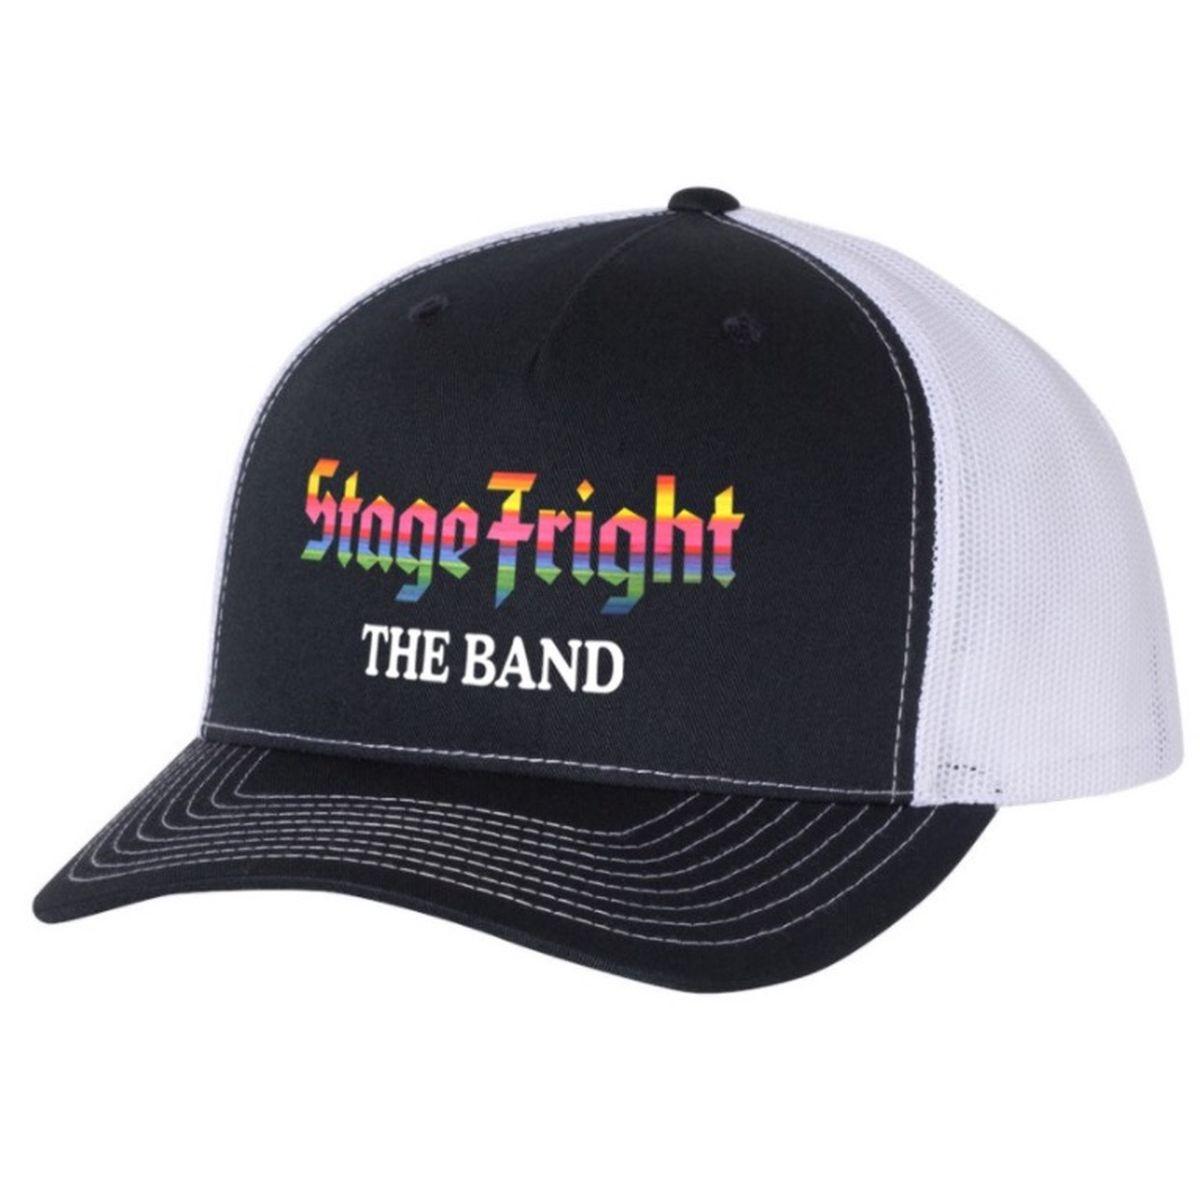 Stage Fright Black Trucker Hat